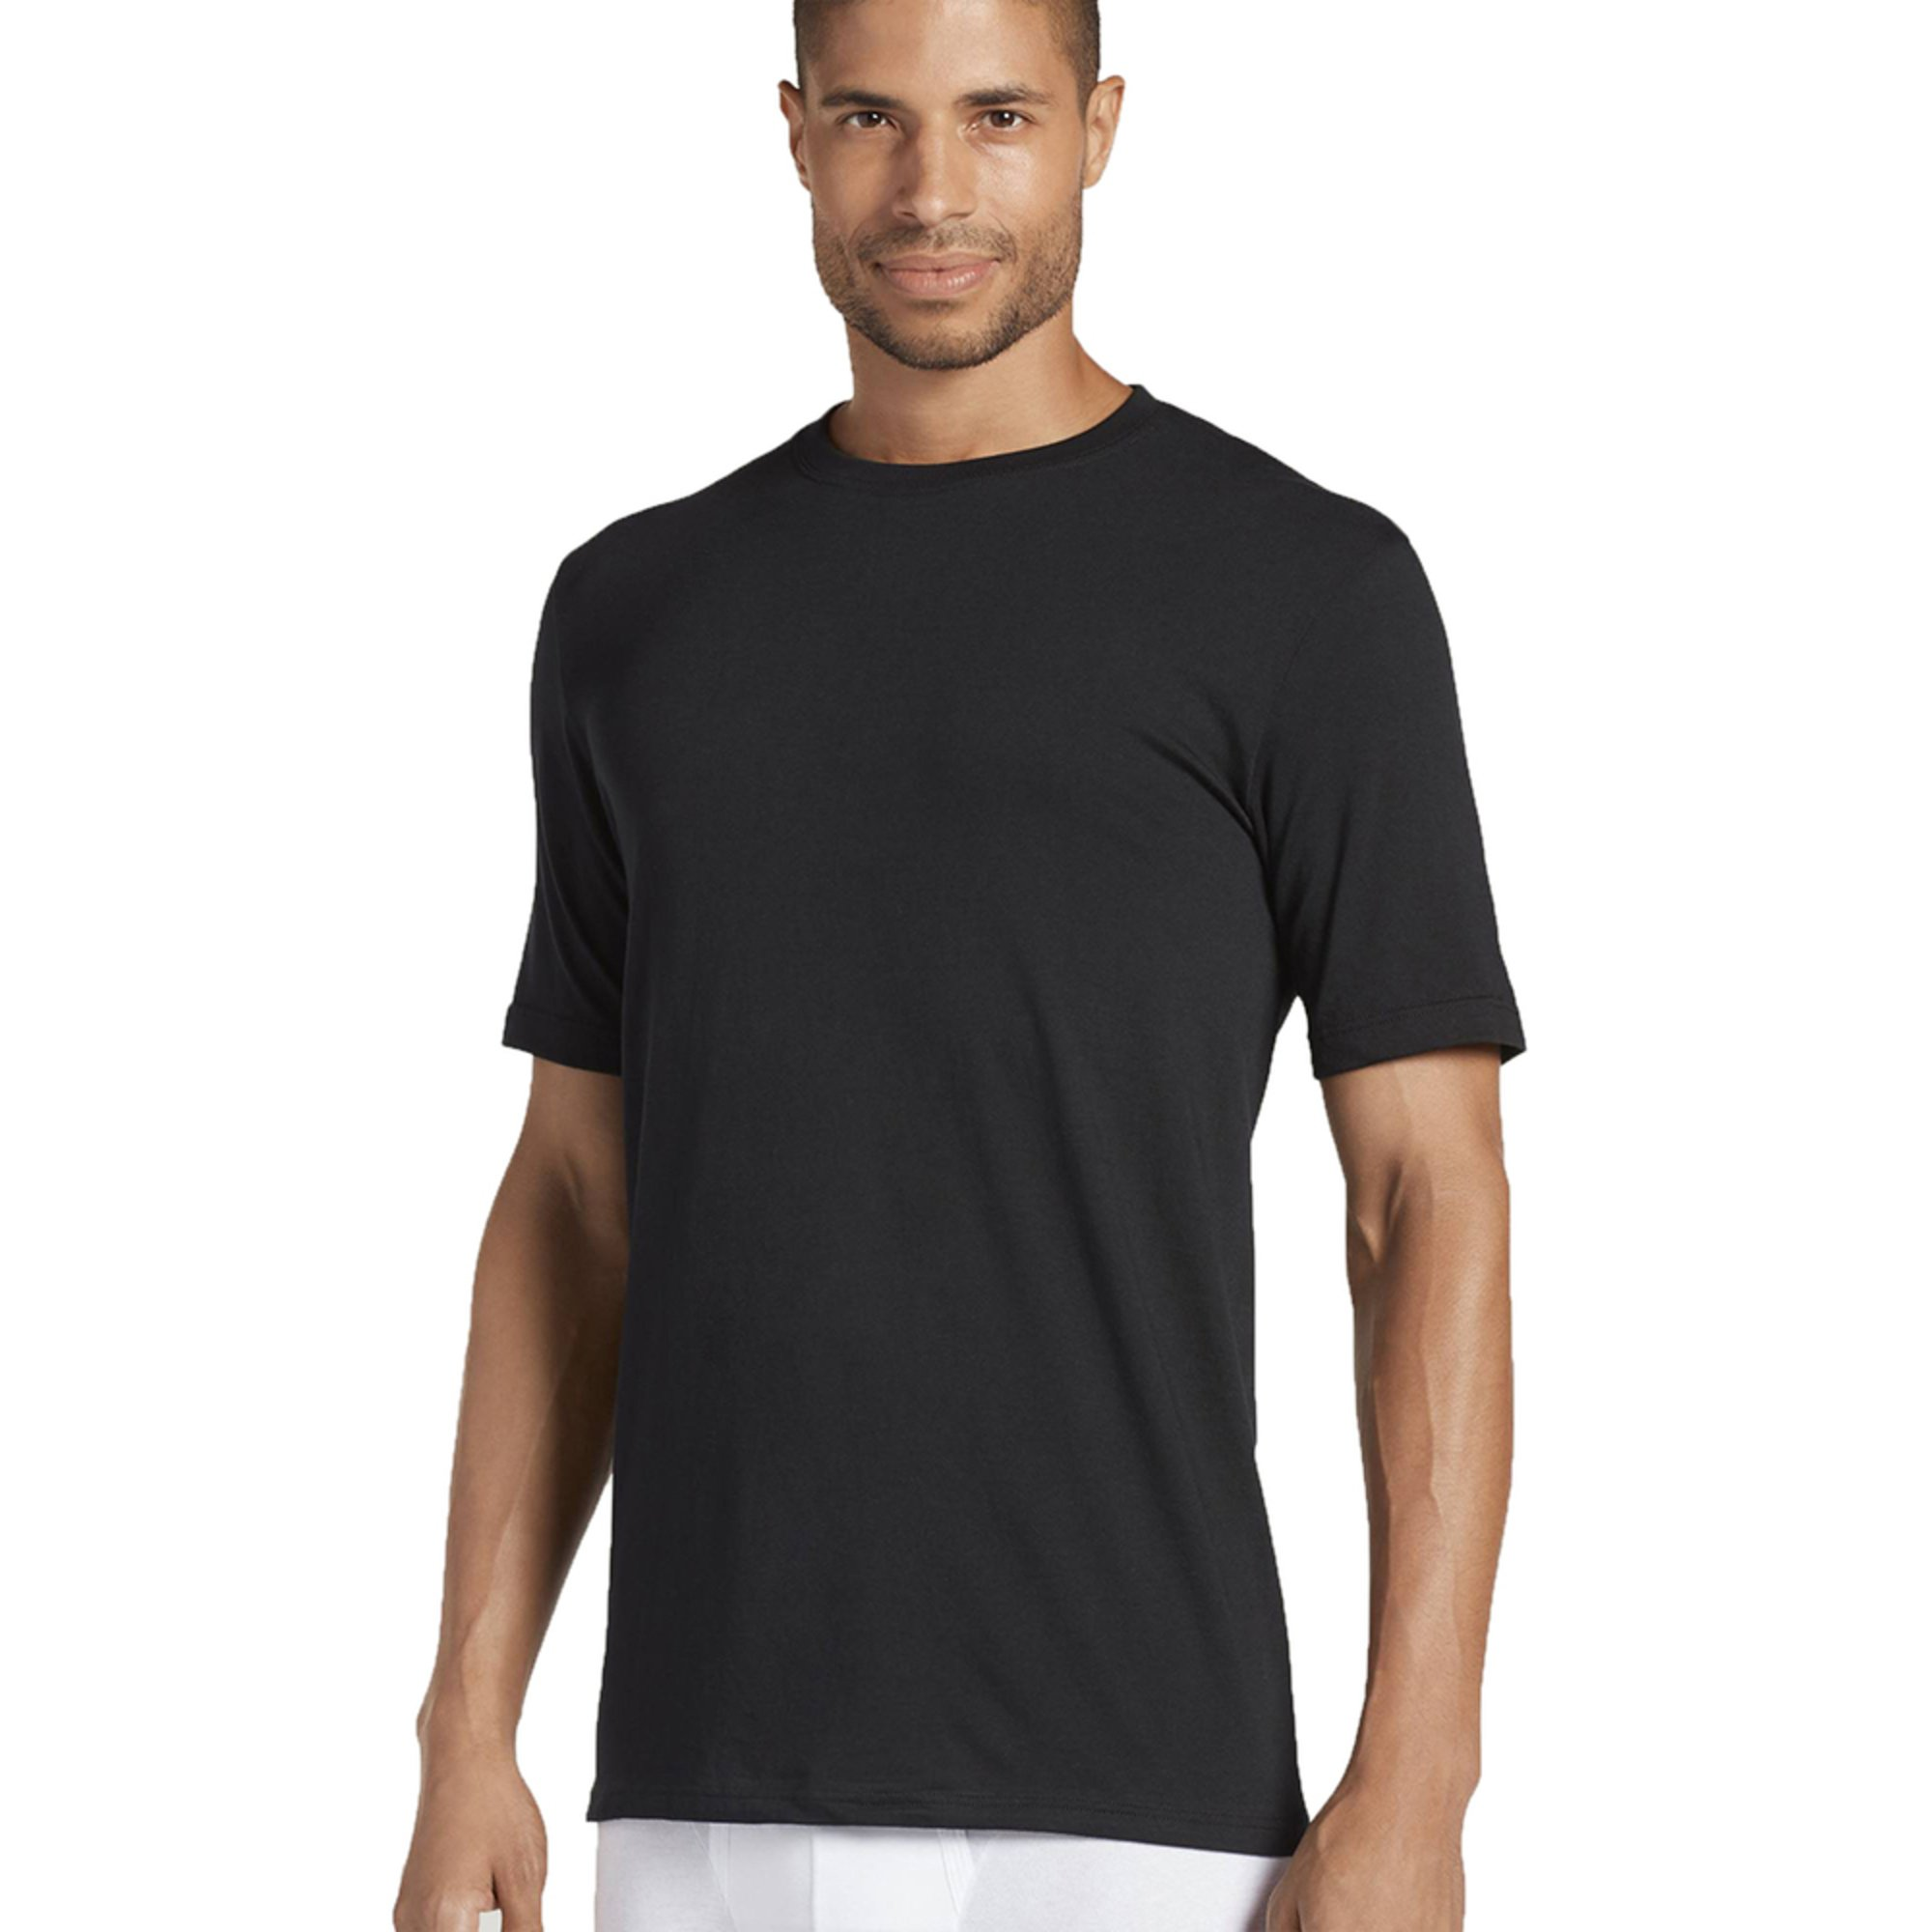 2f0fb1cb Jockey Men's Crew Neck T-shirt 3-pack - Black | Men's Underwear ...